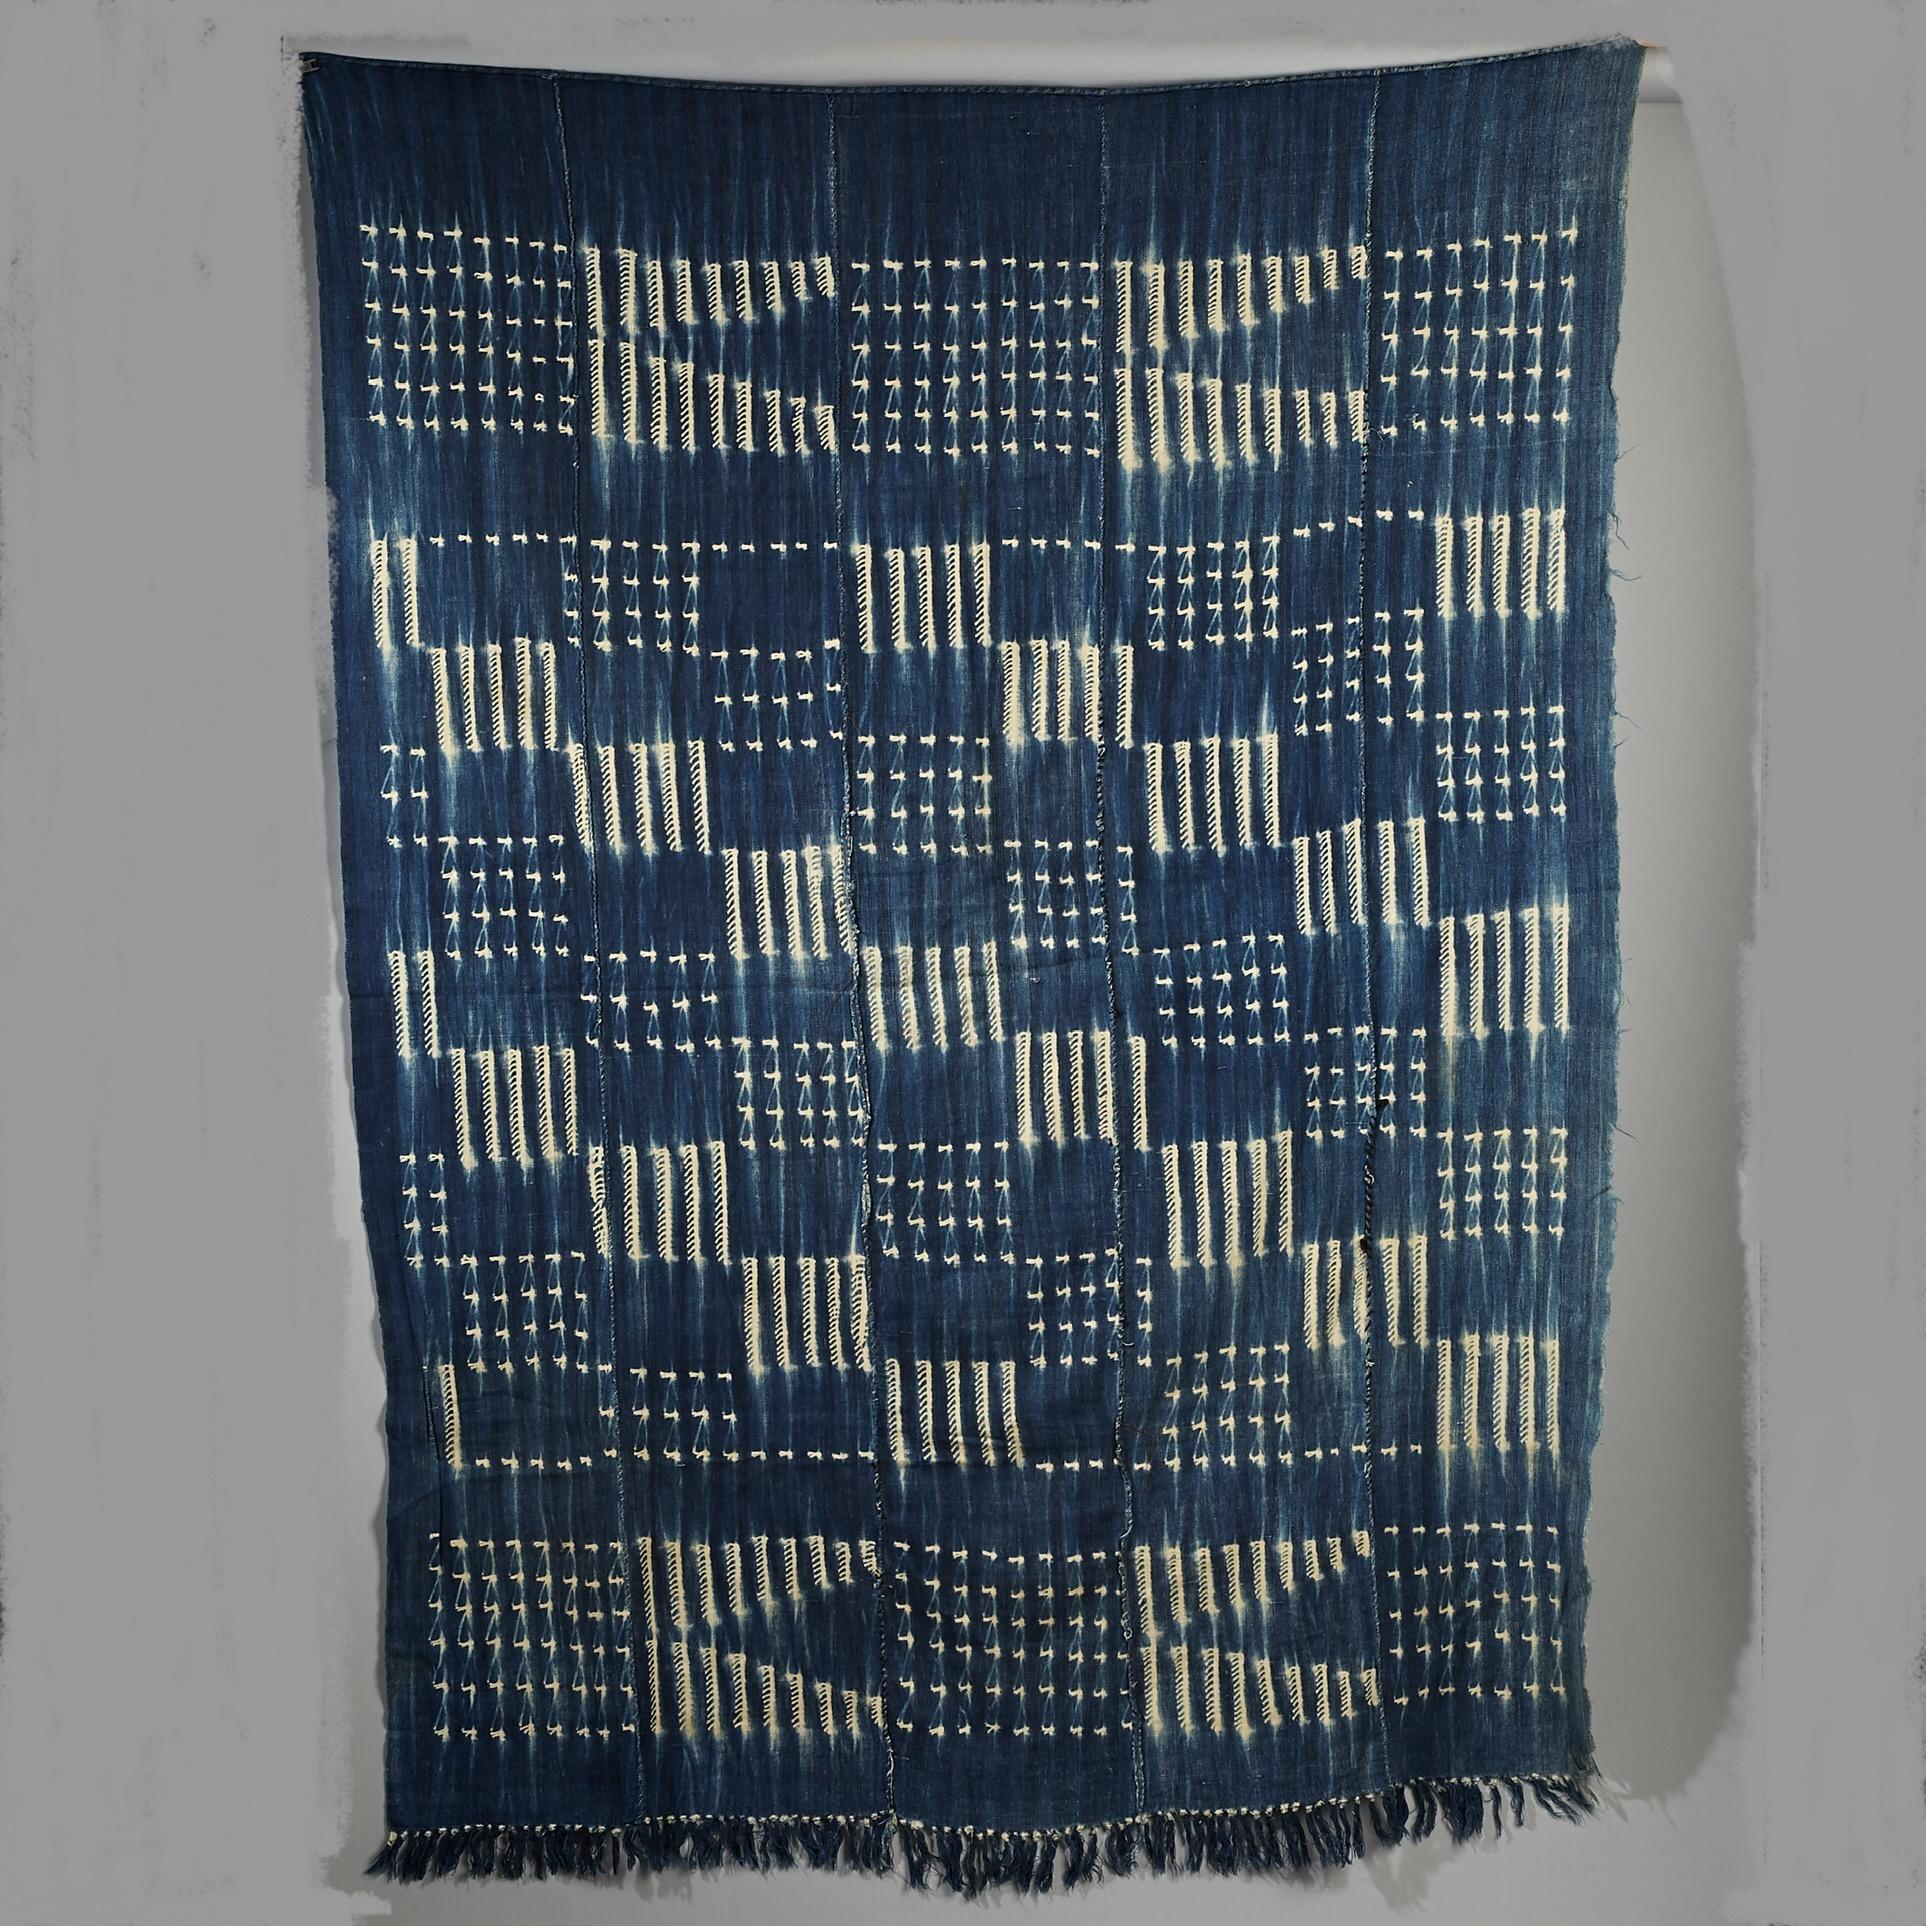 A GRAPHIC CHEQUERED INDIGO CLOTH FROM BURKINA FASO ( No 3025 )